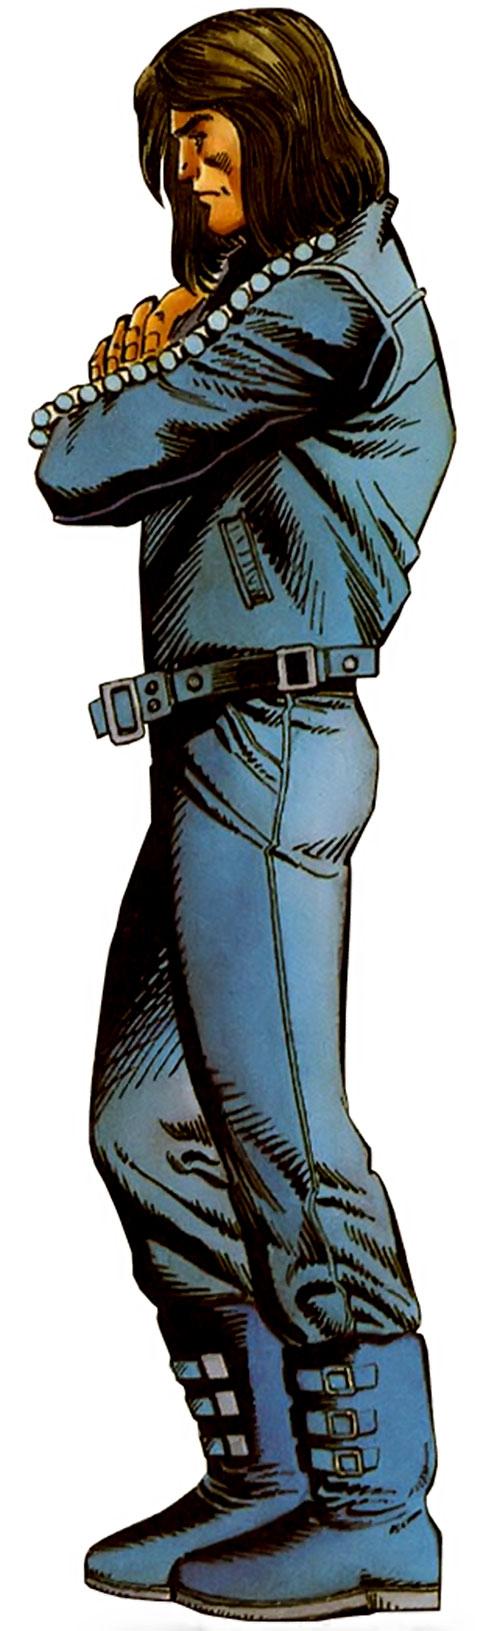 Gilad Anni Padda the Eternal Warrior (Original 1990s Valiant comics) crossed arms side view